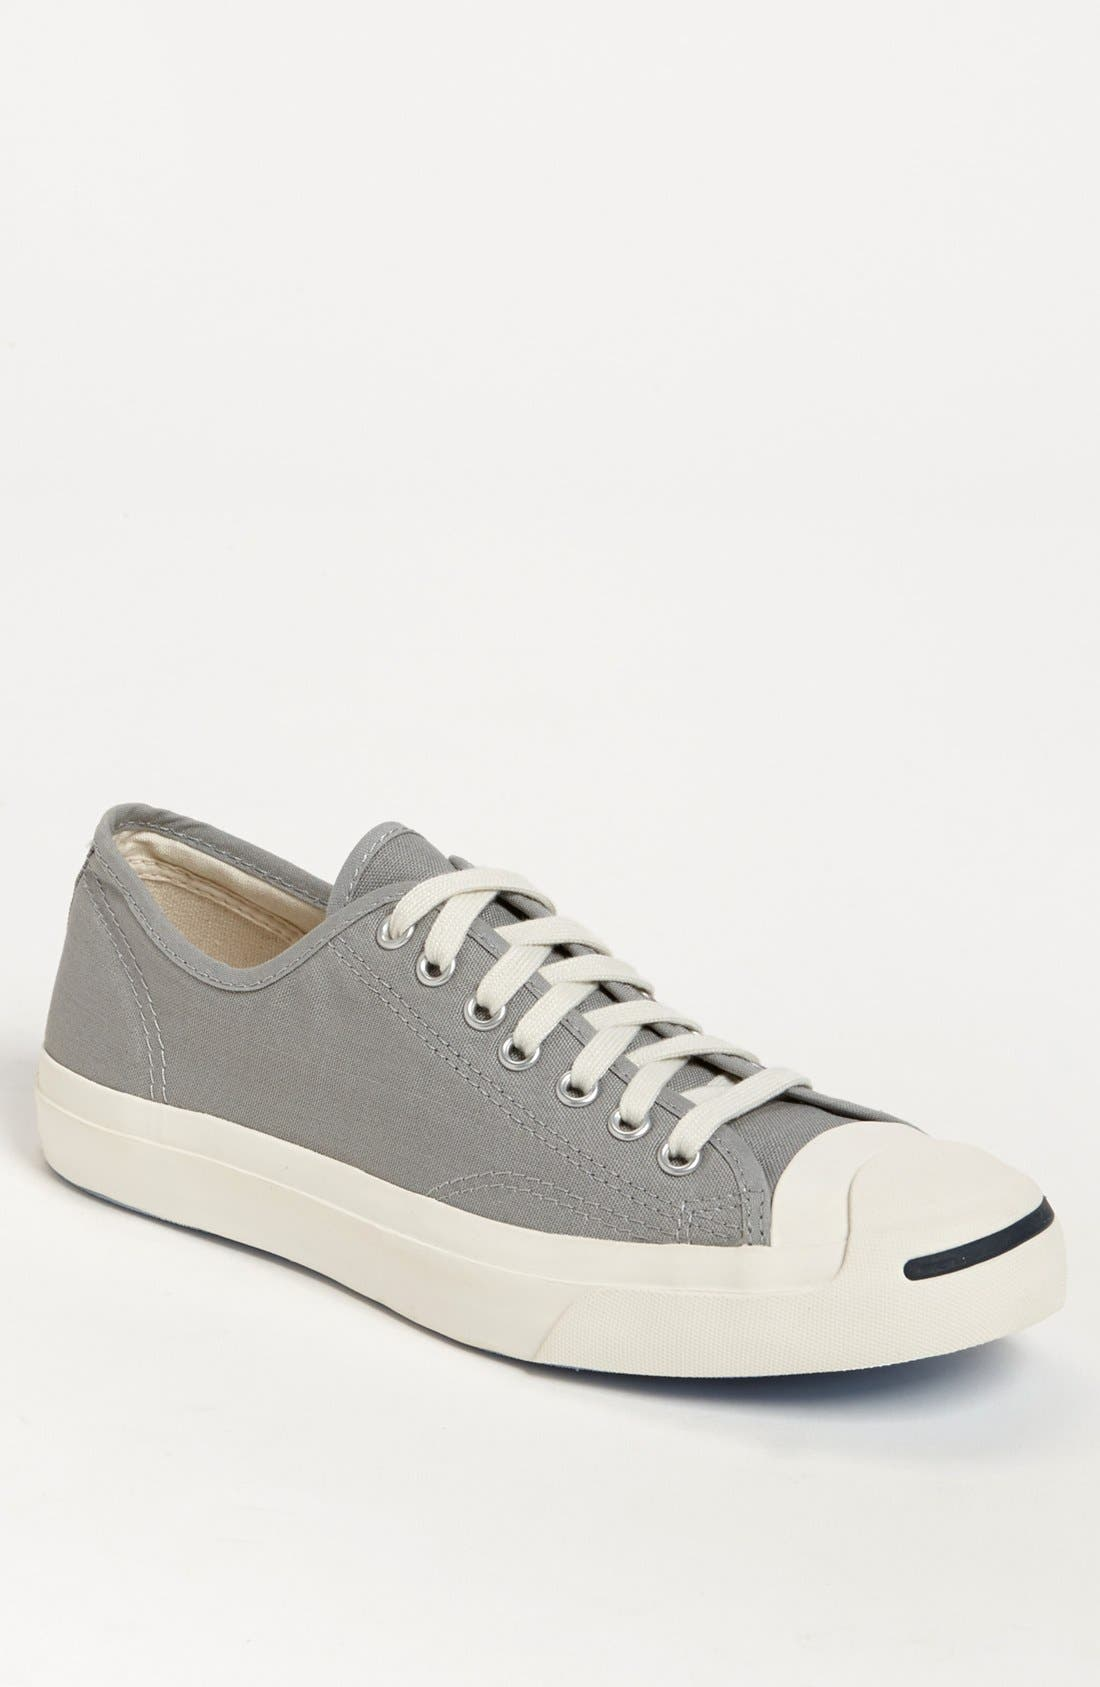 Alternate Image 1 Selected - Converse 'Jack Purcell LTT' Sneaker (Men)